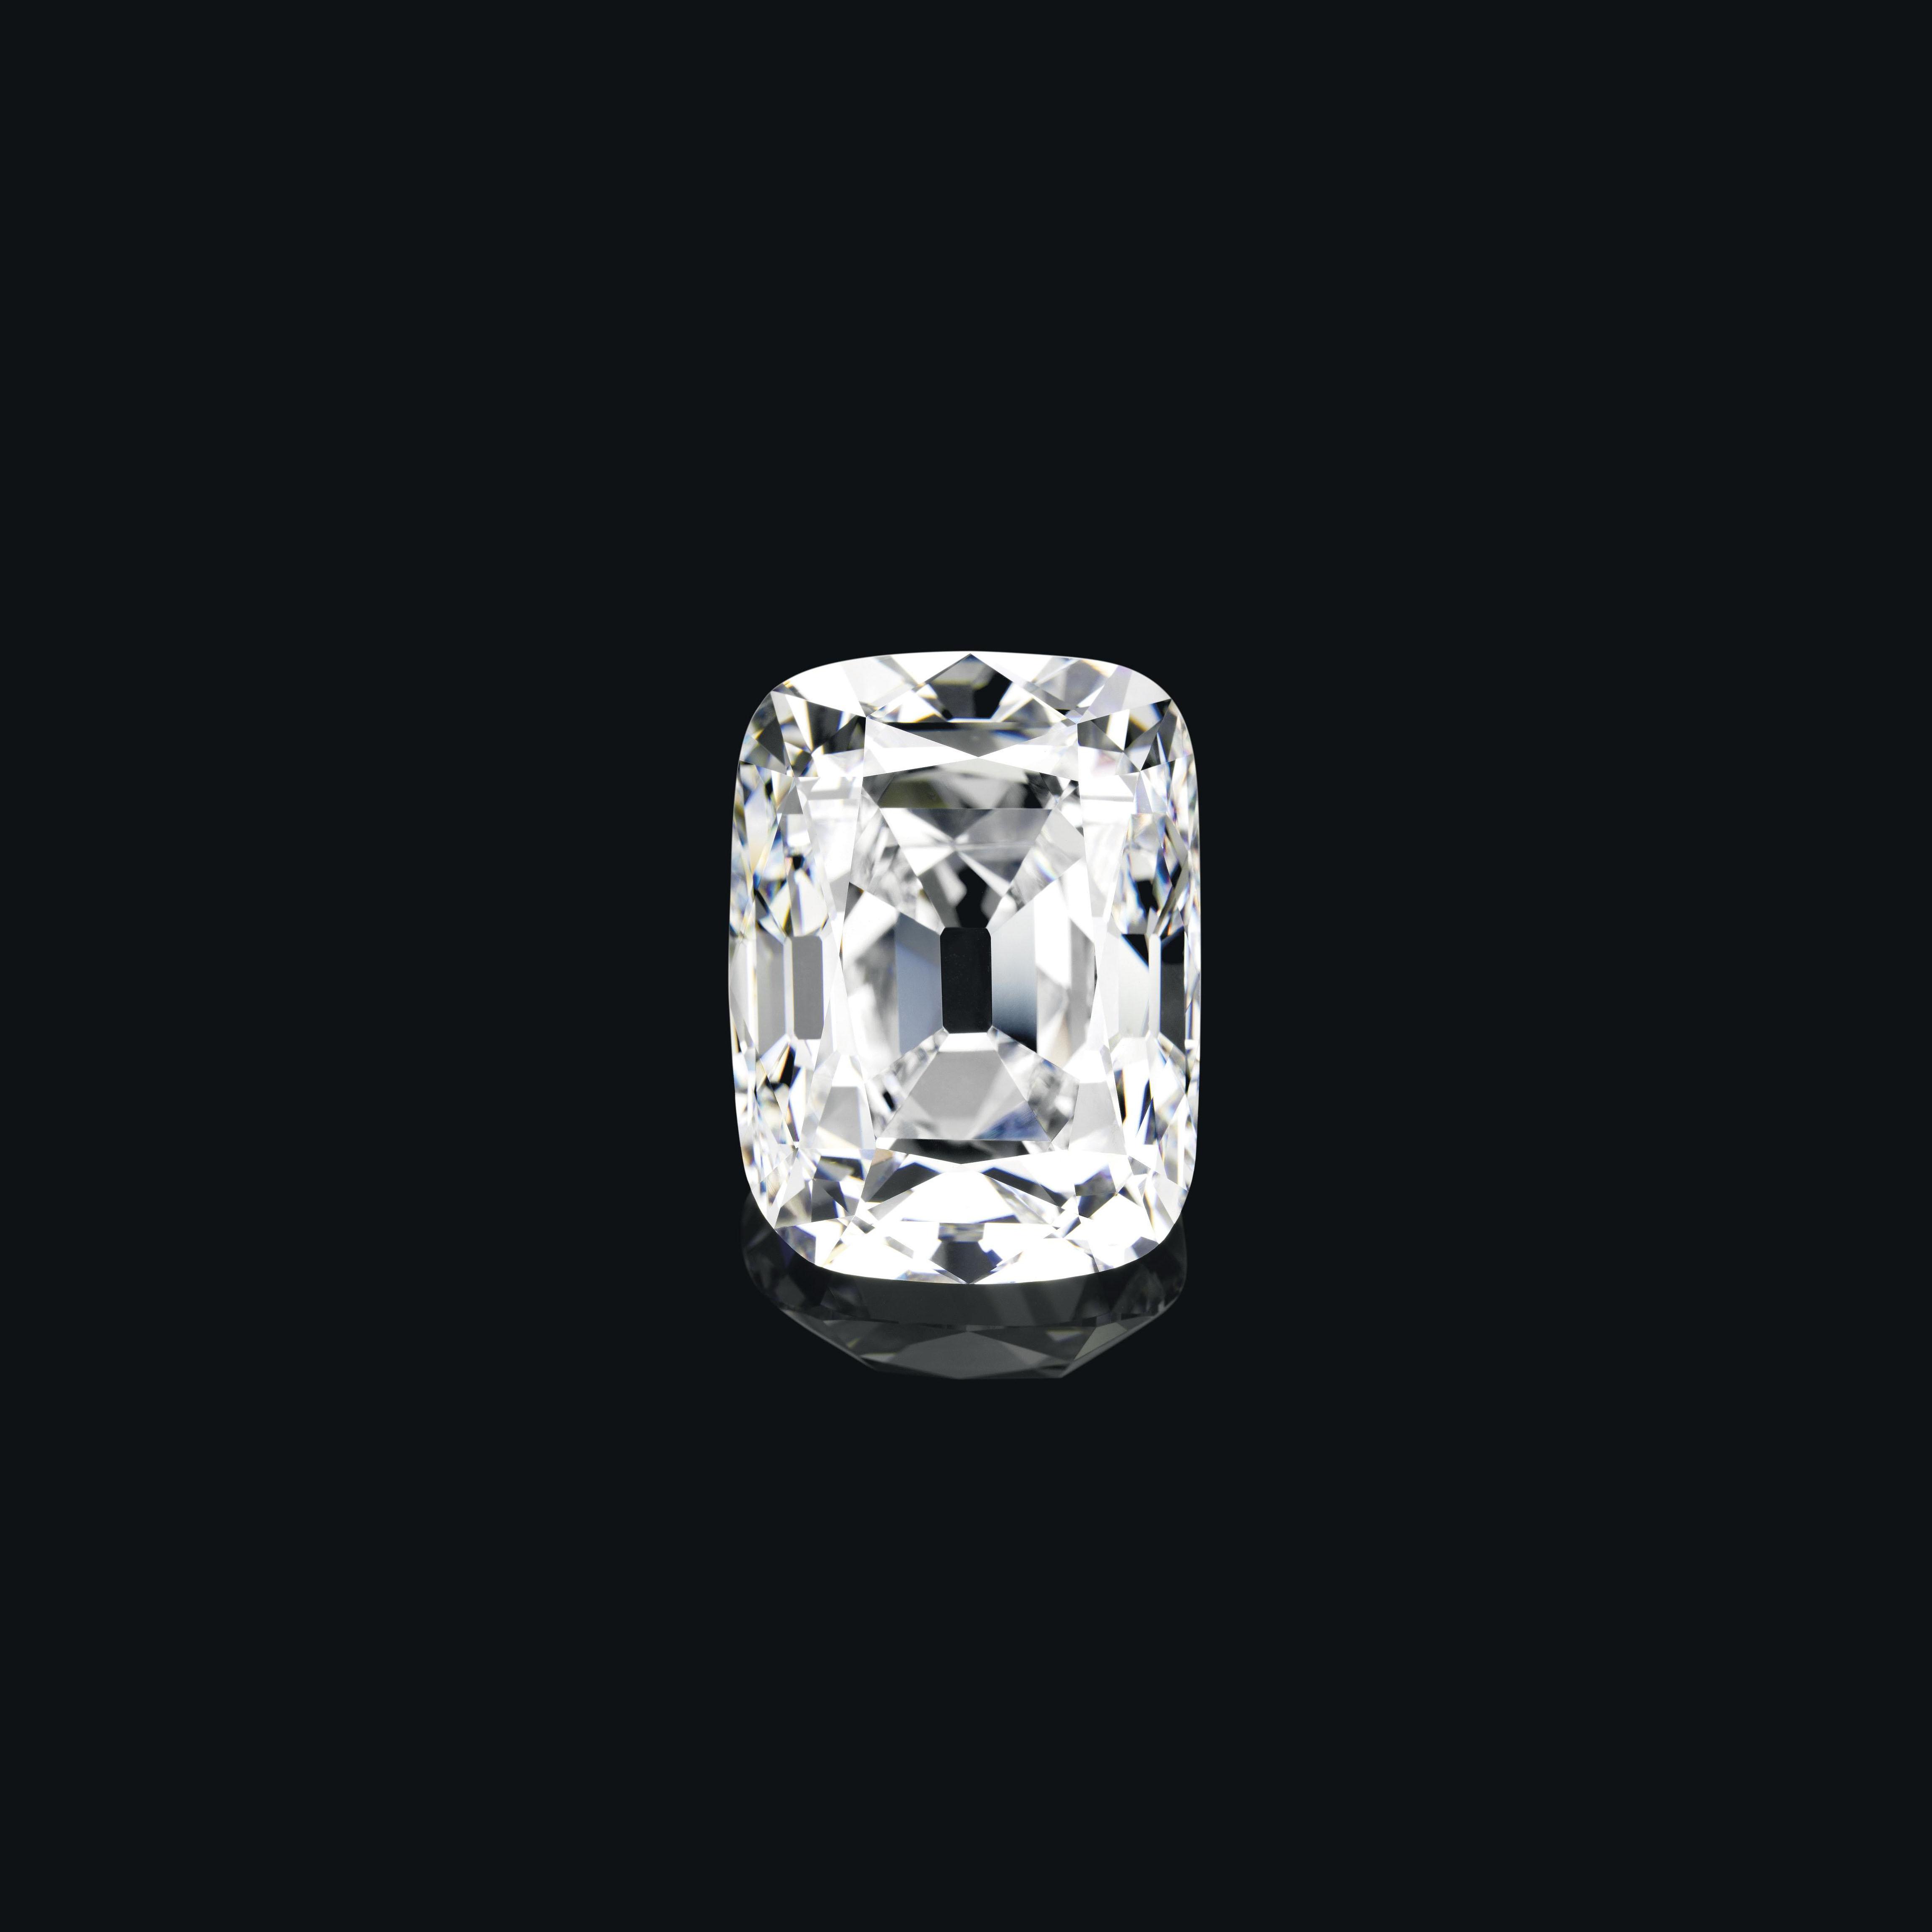 THE ARCHDUKE JOSEPH DIAMOND